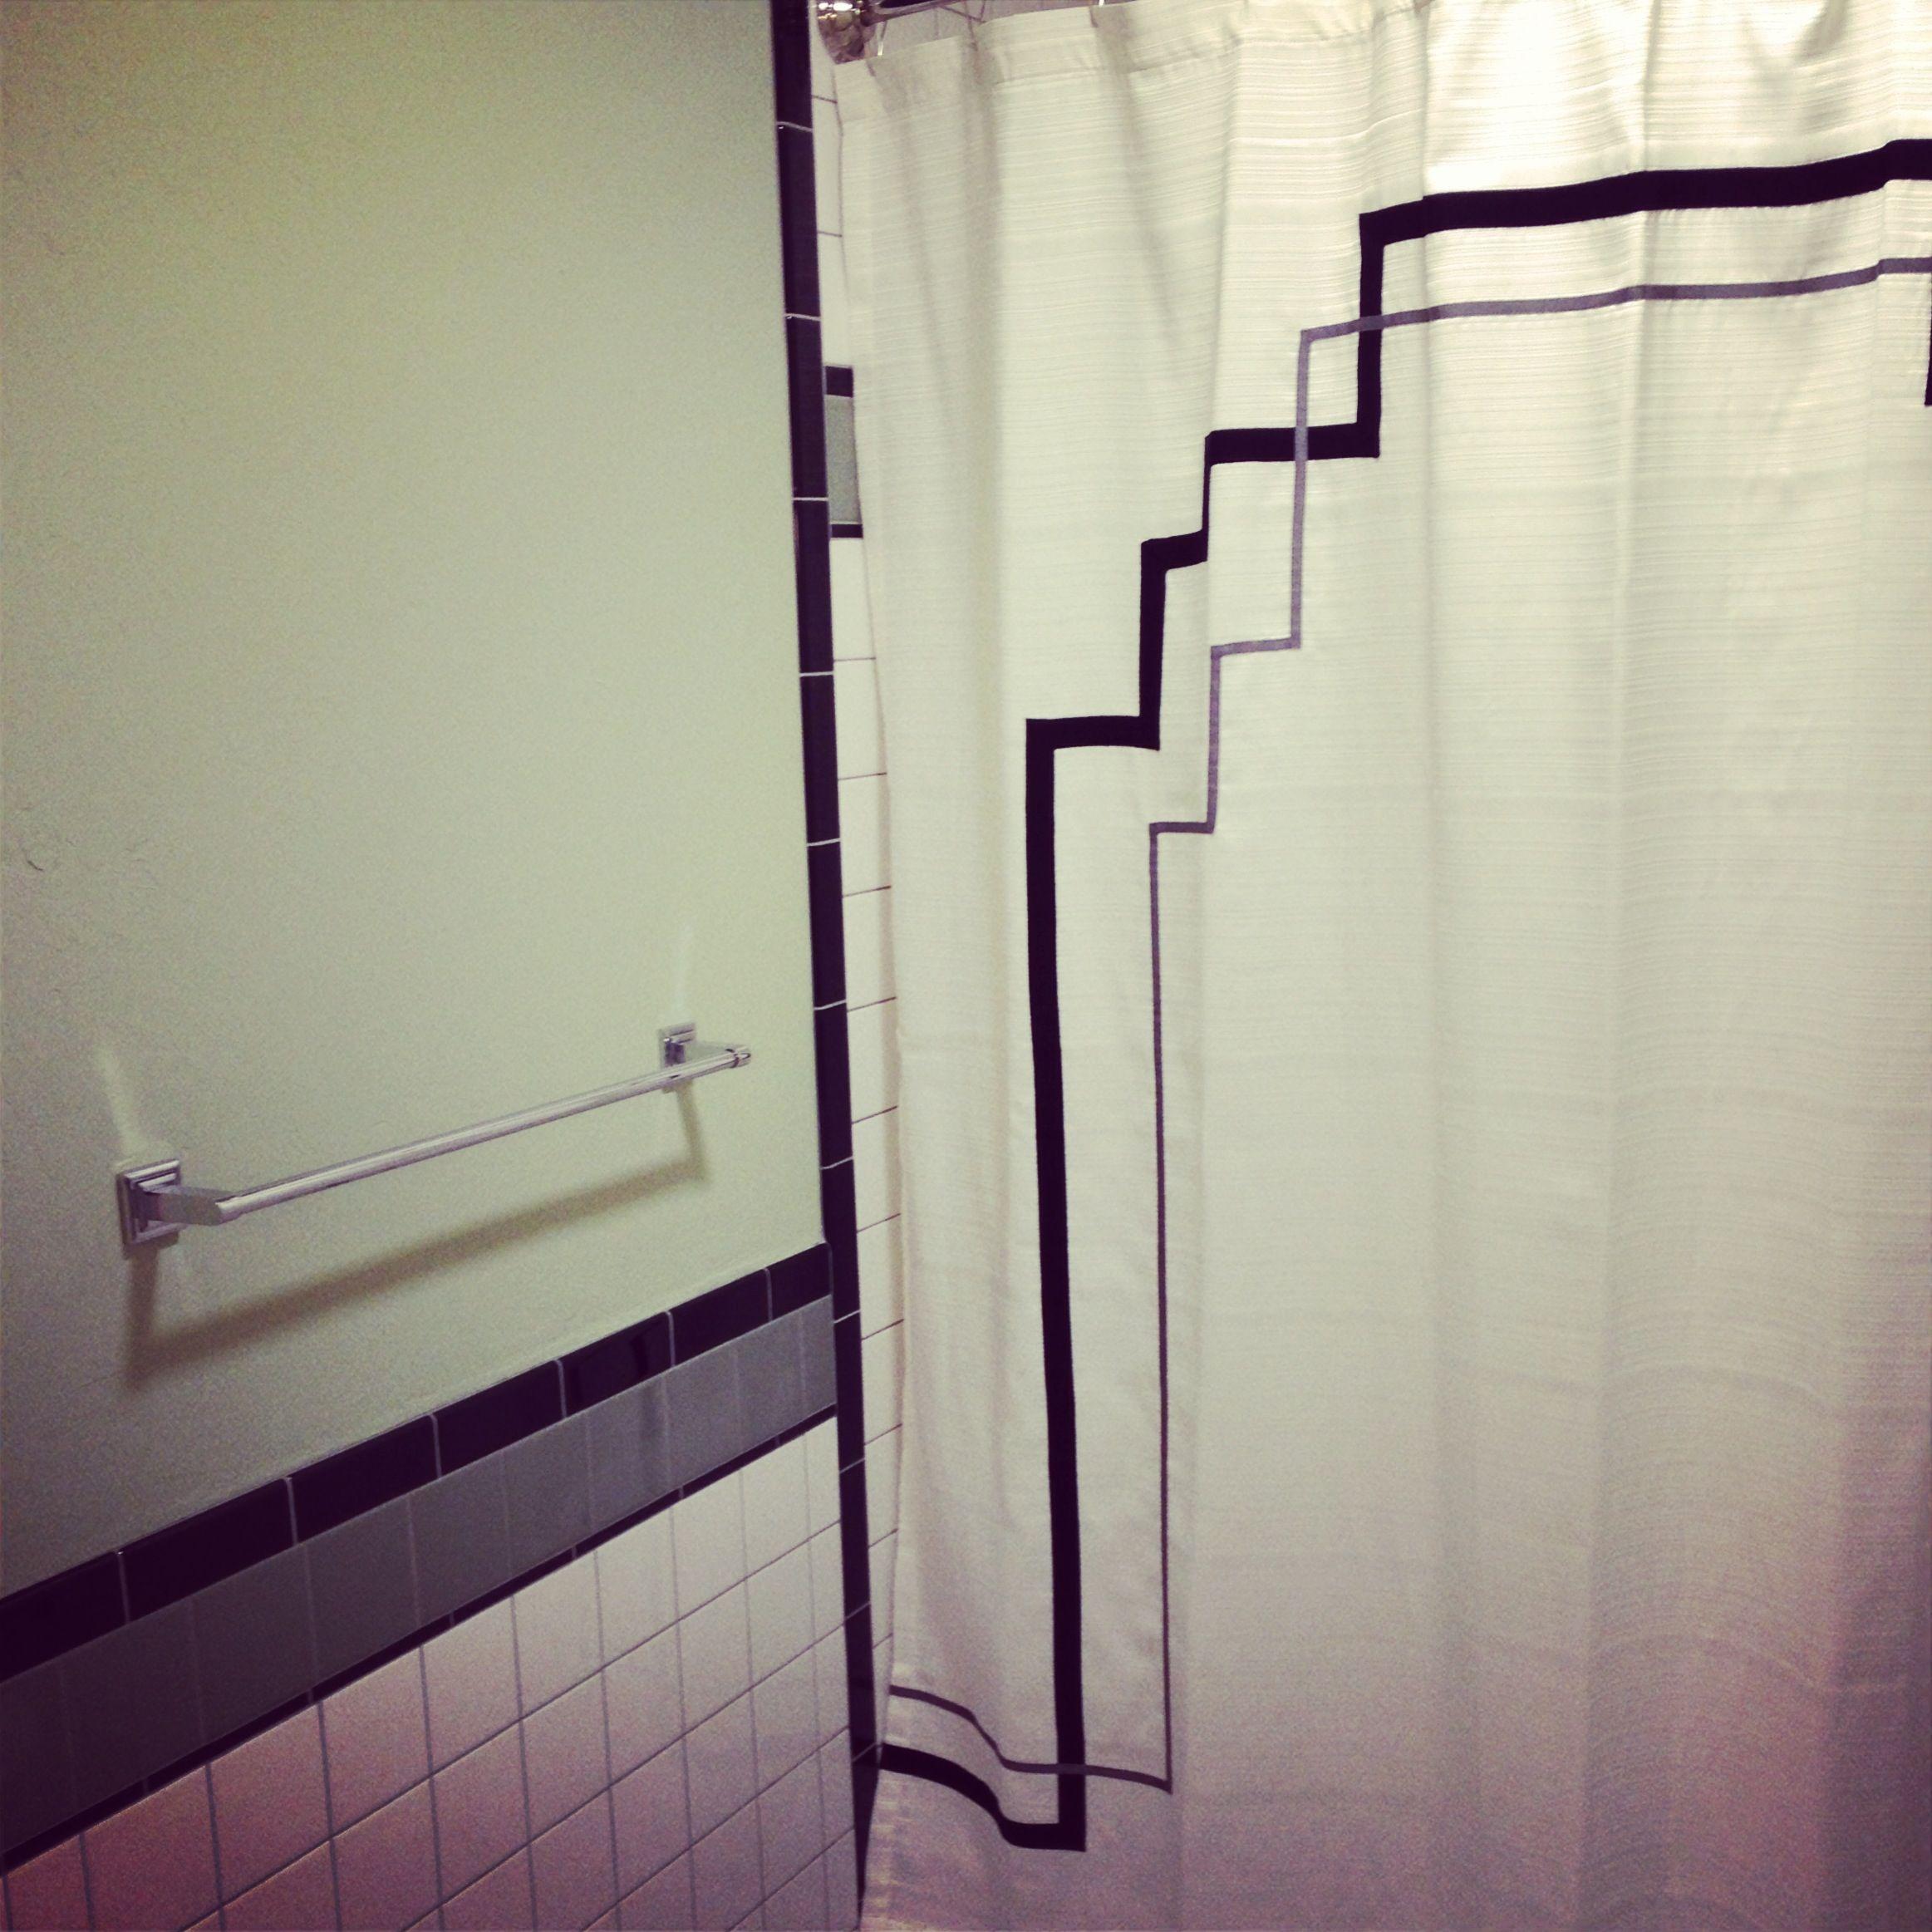 Art Deco Tile Work And Custom Shower Curtain Design By Studiobdesigngroup